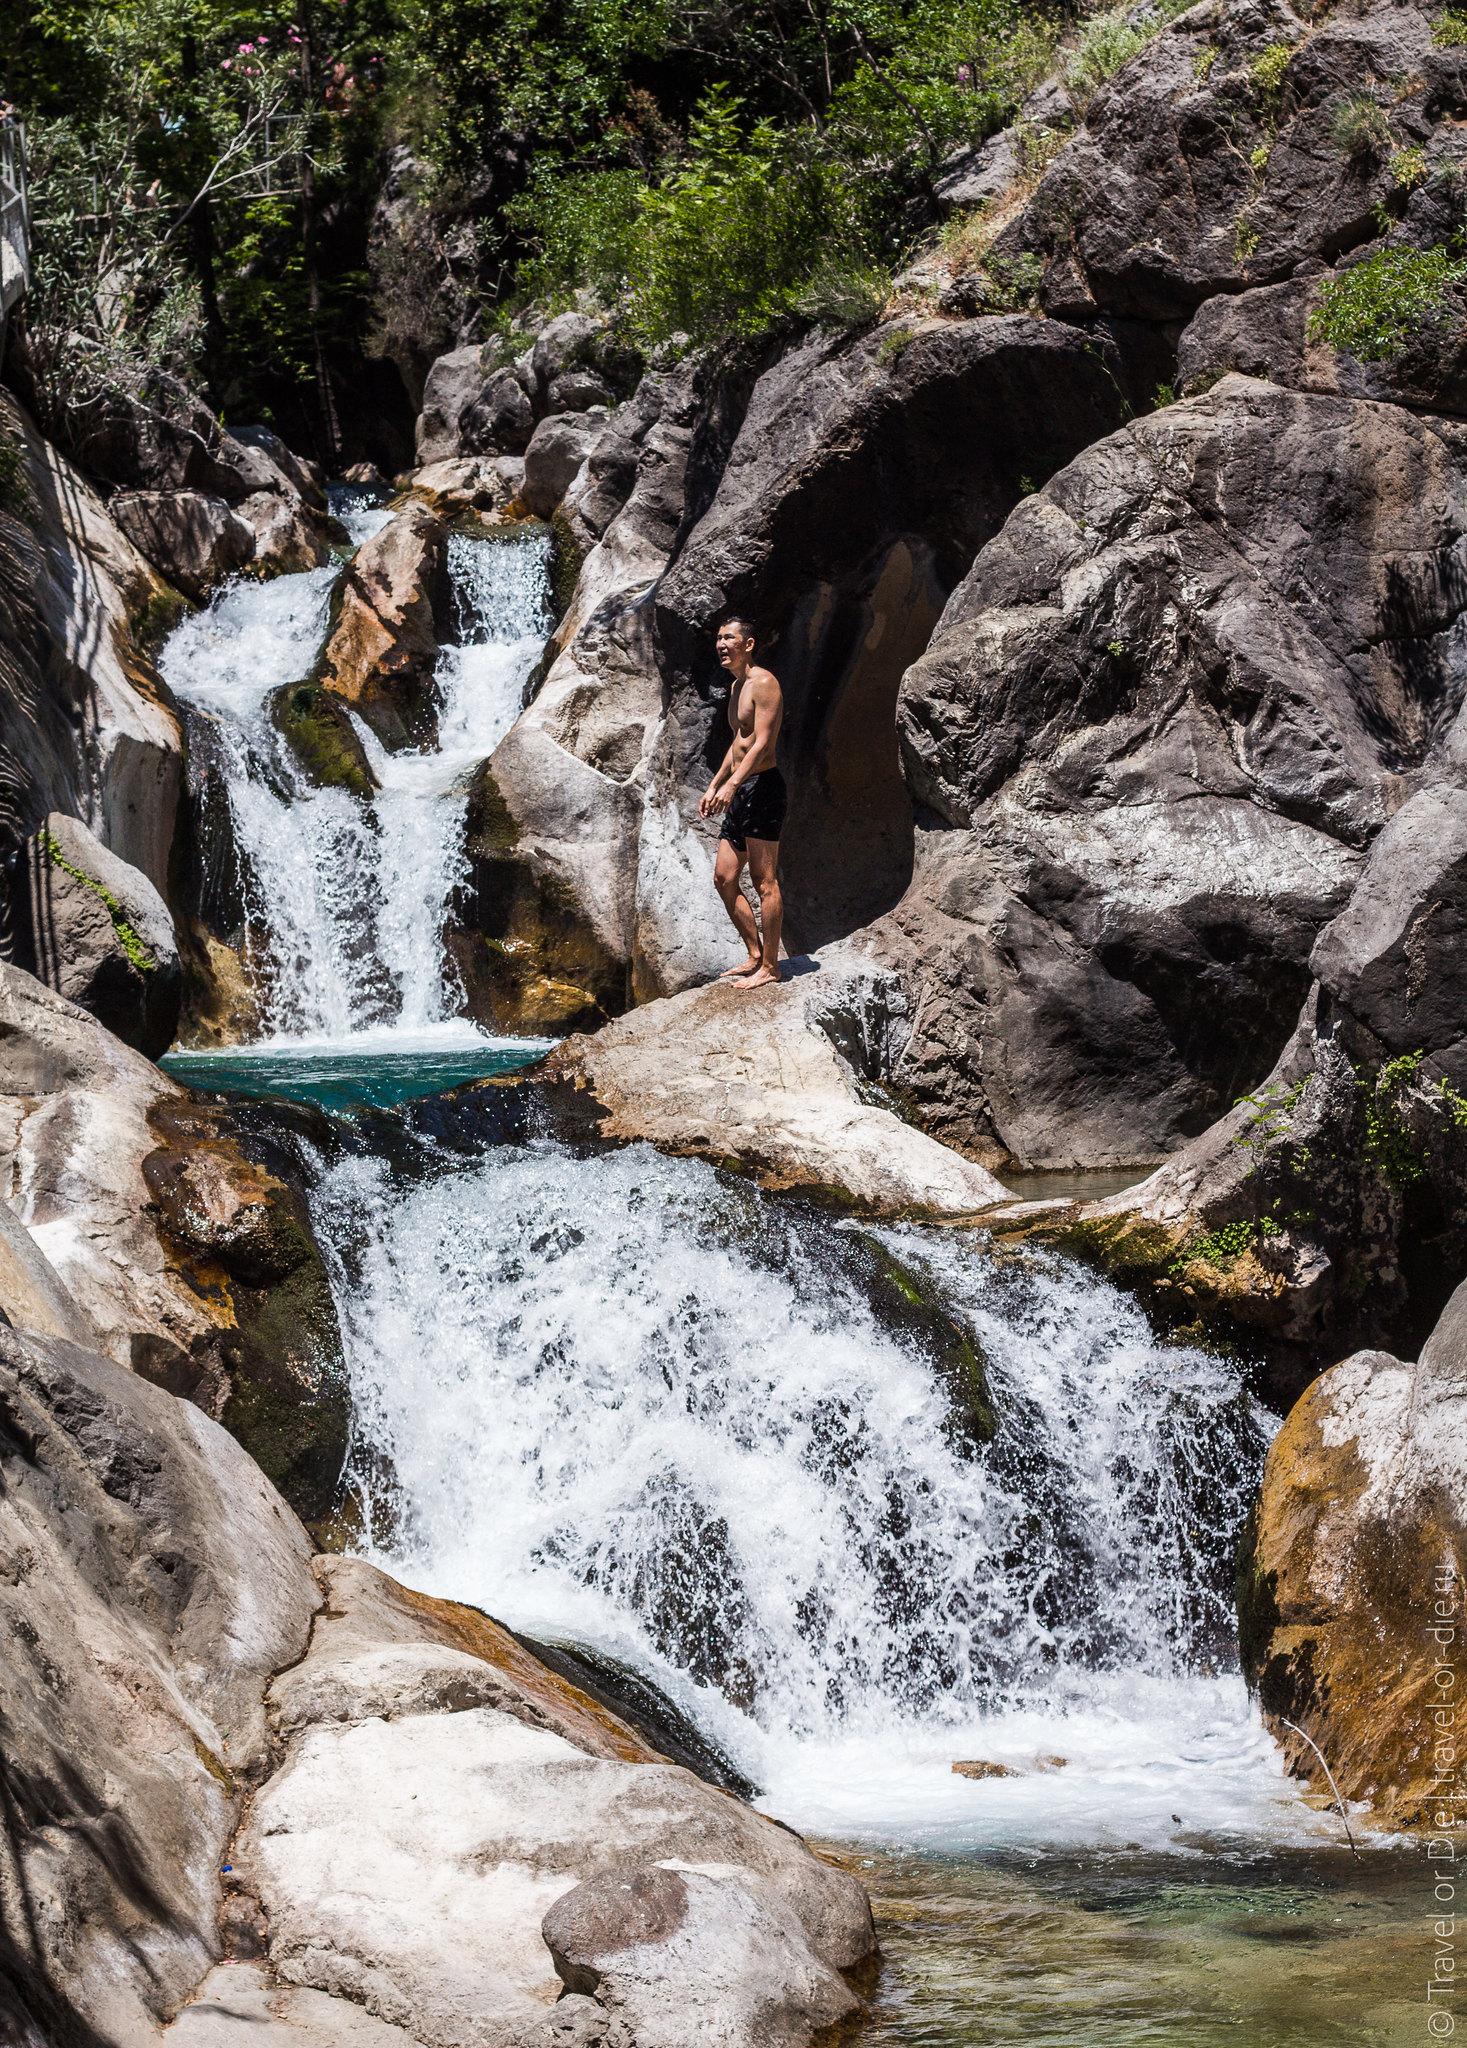 Sapadere-Canyon-Tour-экскурсия-в-каньон-сападере-6246